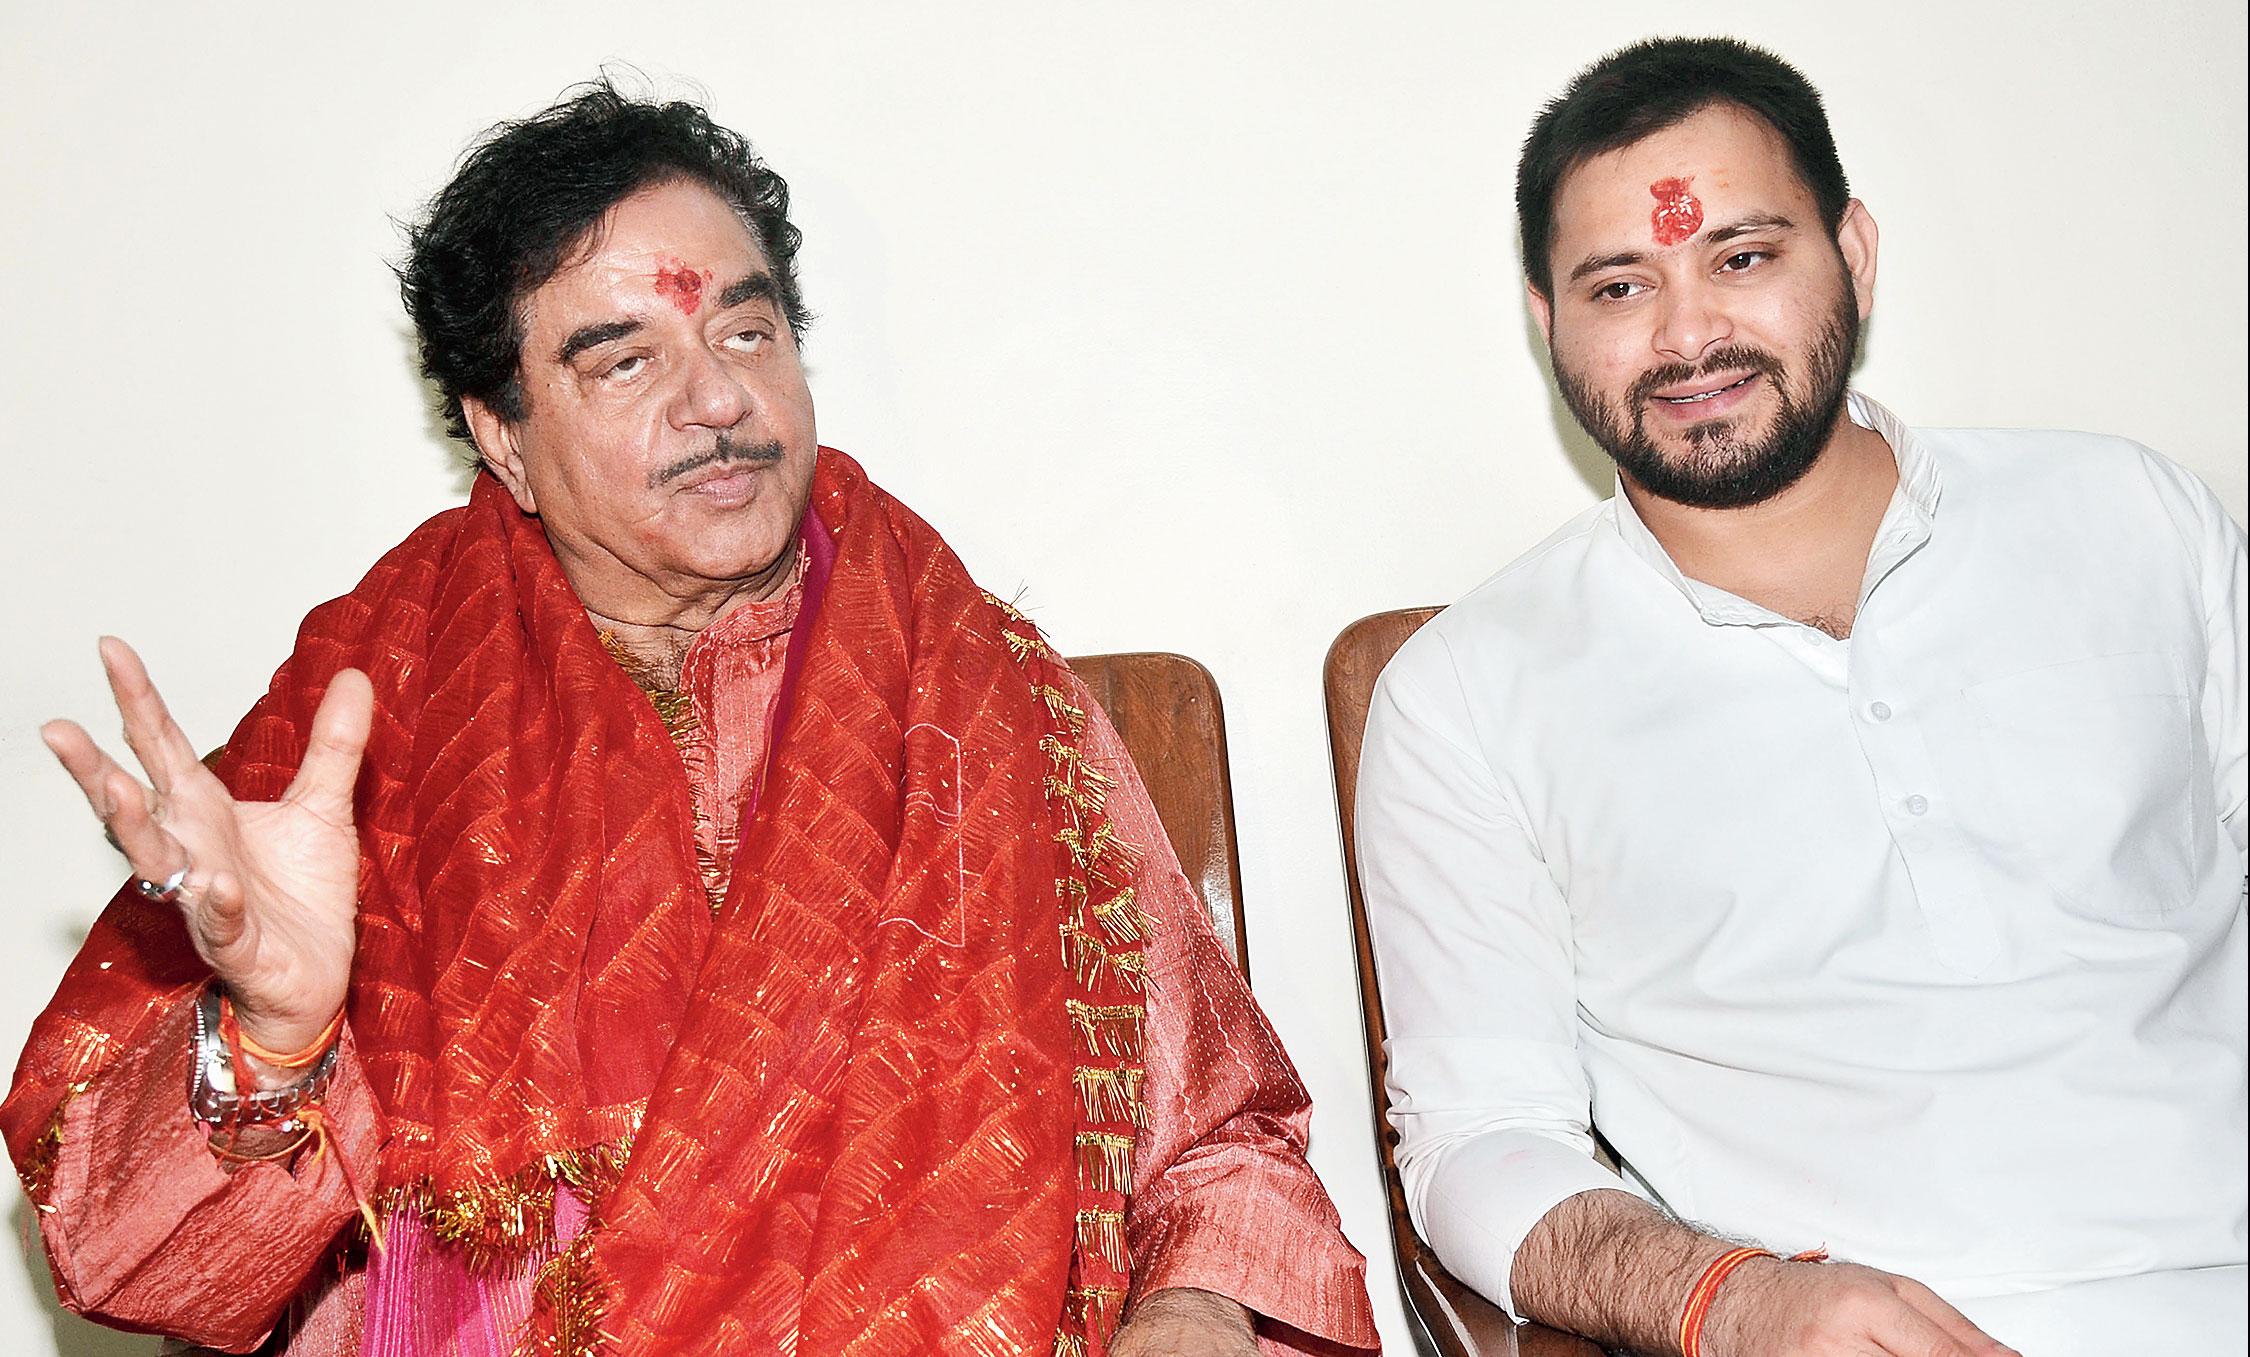 Shatrughan Sinha at home with Tejashwi Prasad Yadav in Patna on Wednesday night.